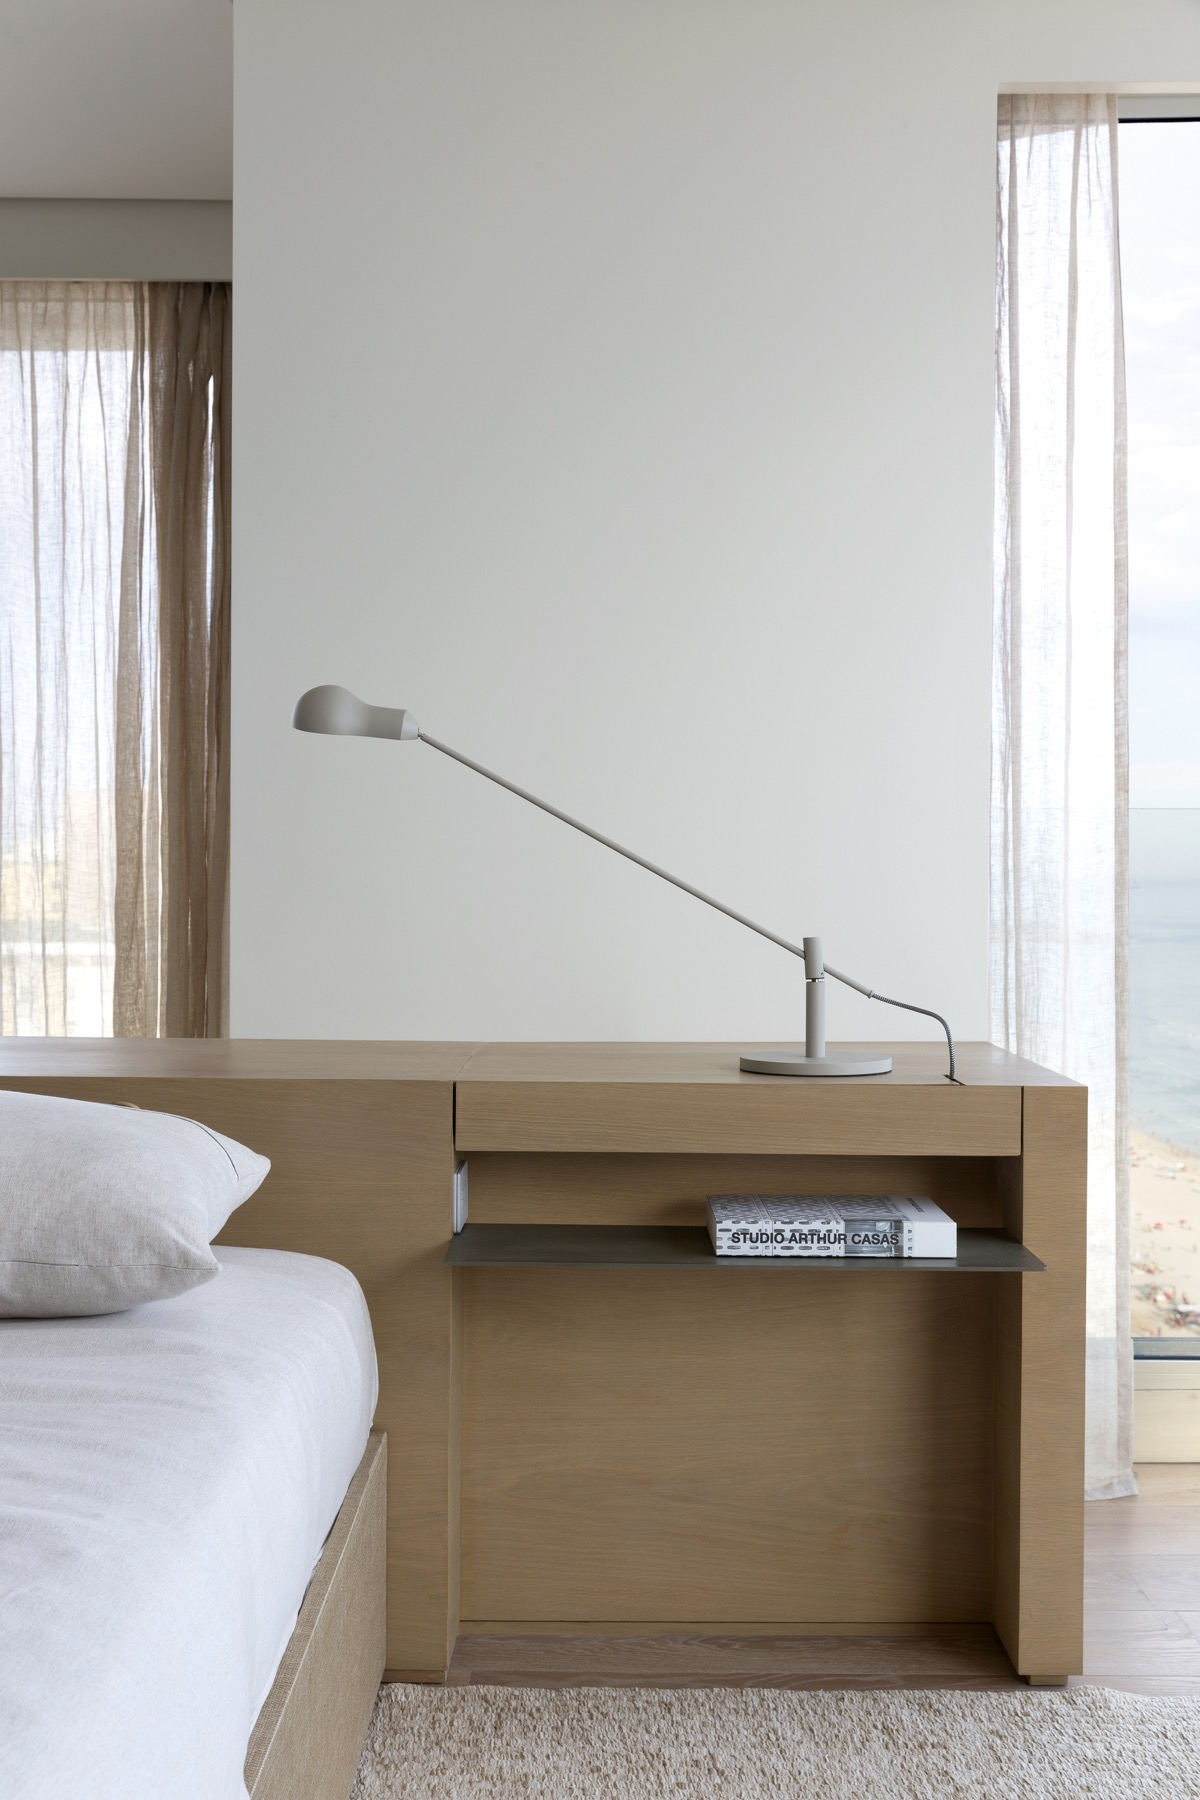 designer-table-lamp-1